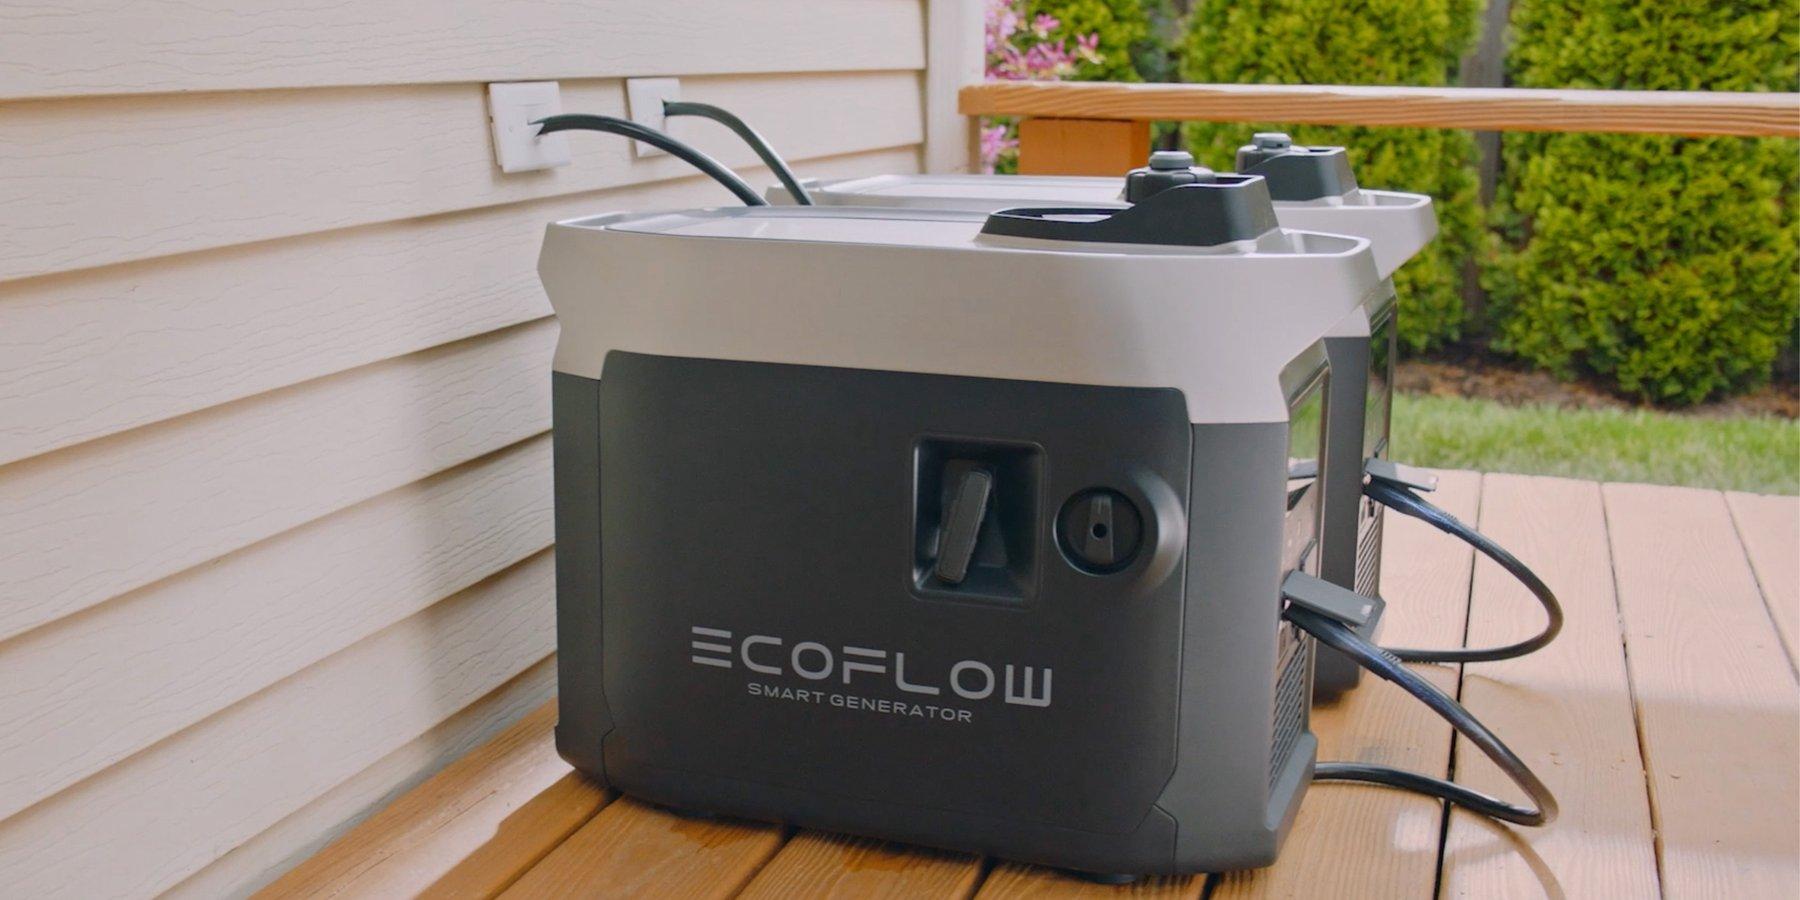 Delta pro ecoflow double batterie smart recharge habitation isolée, camping, van, camping-car